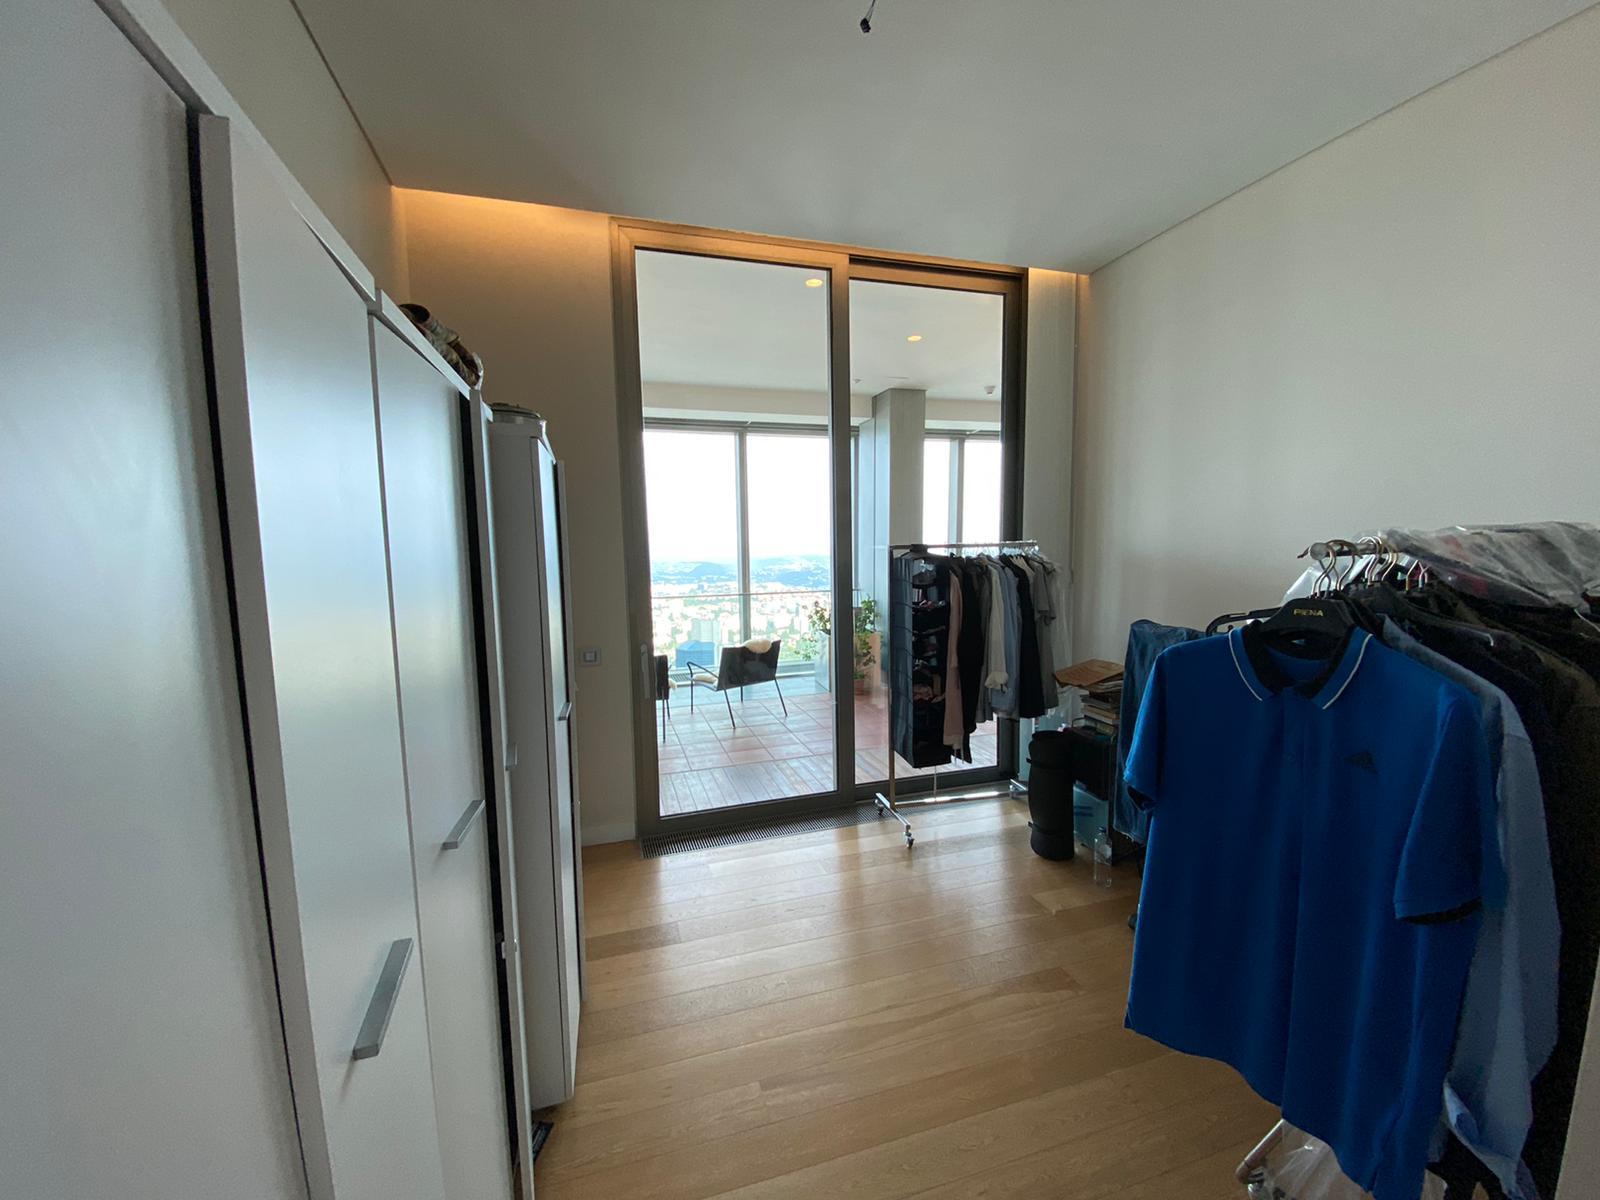 penthouse-istanbul-sapphire-tower-42th-floor-015.jpg